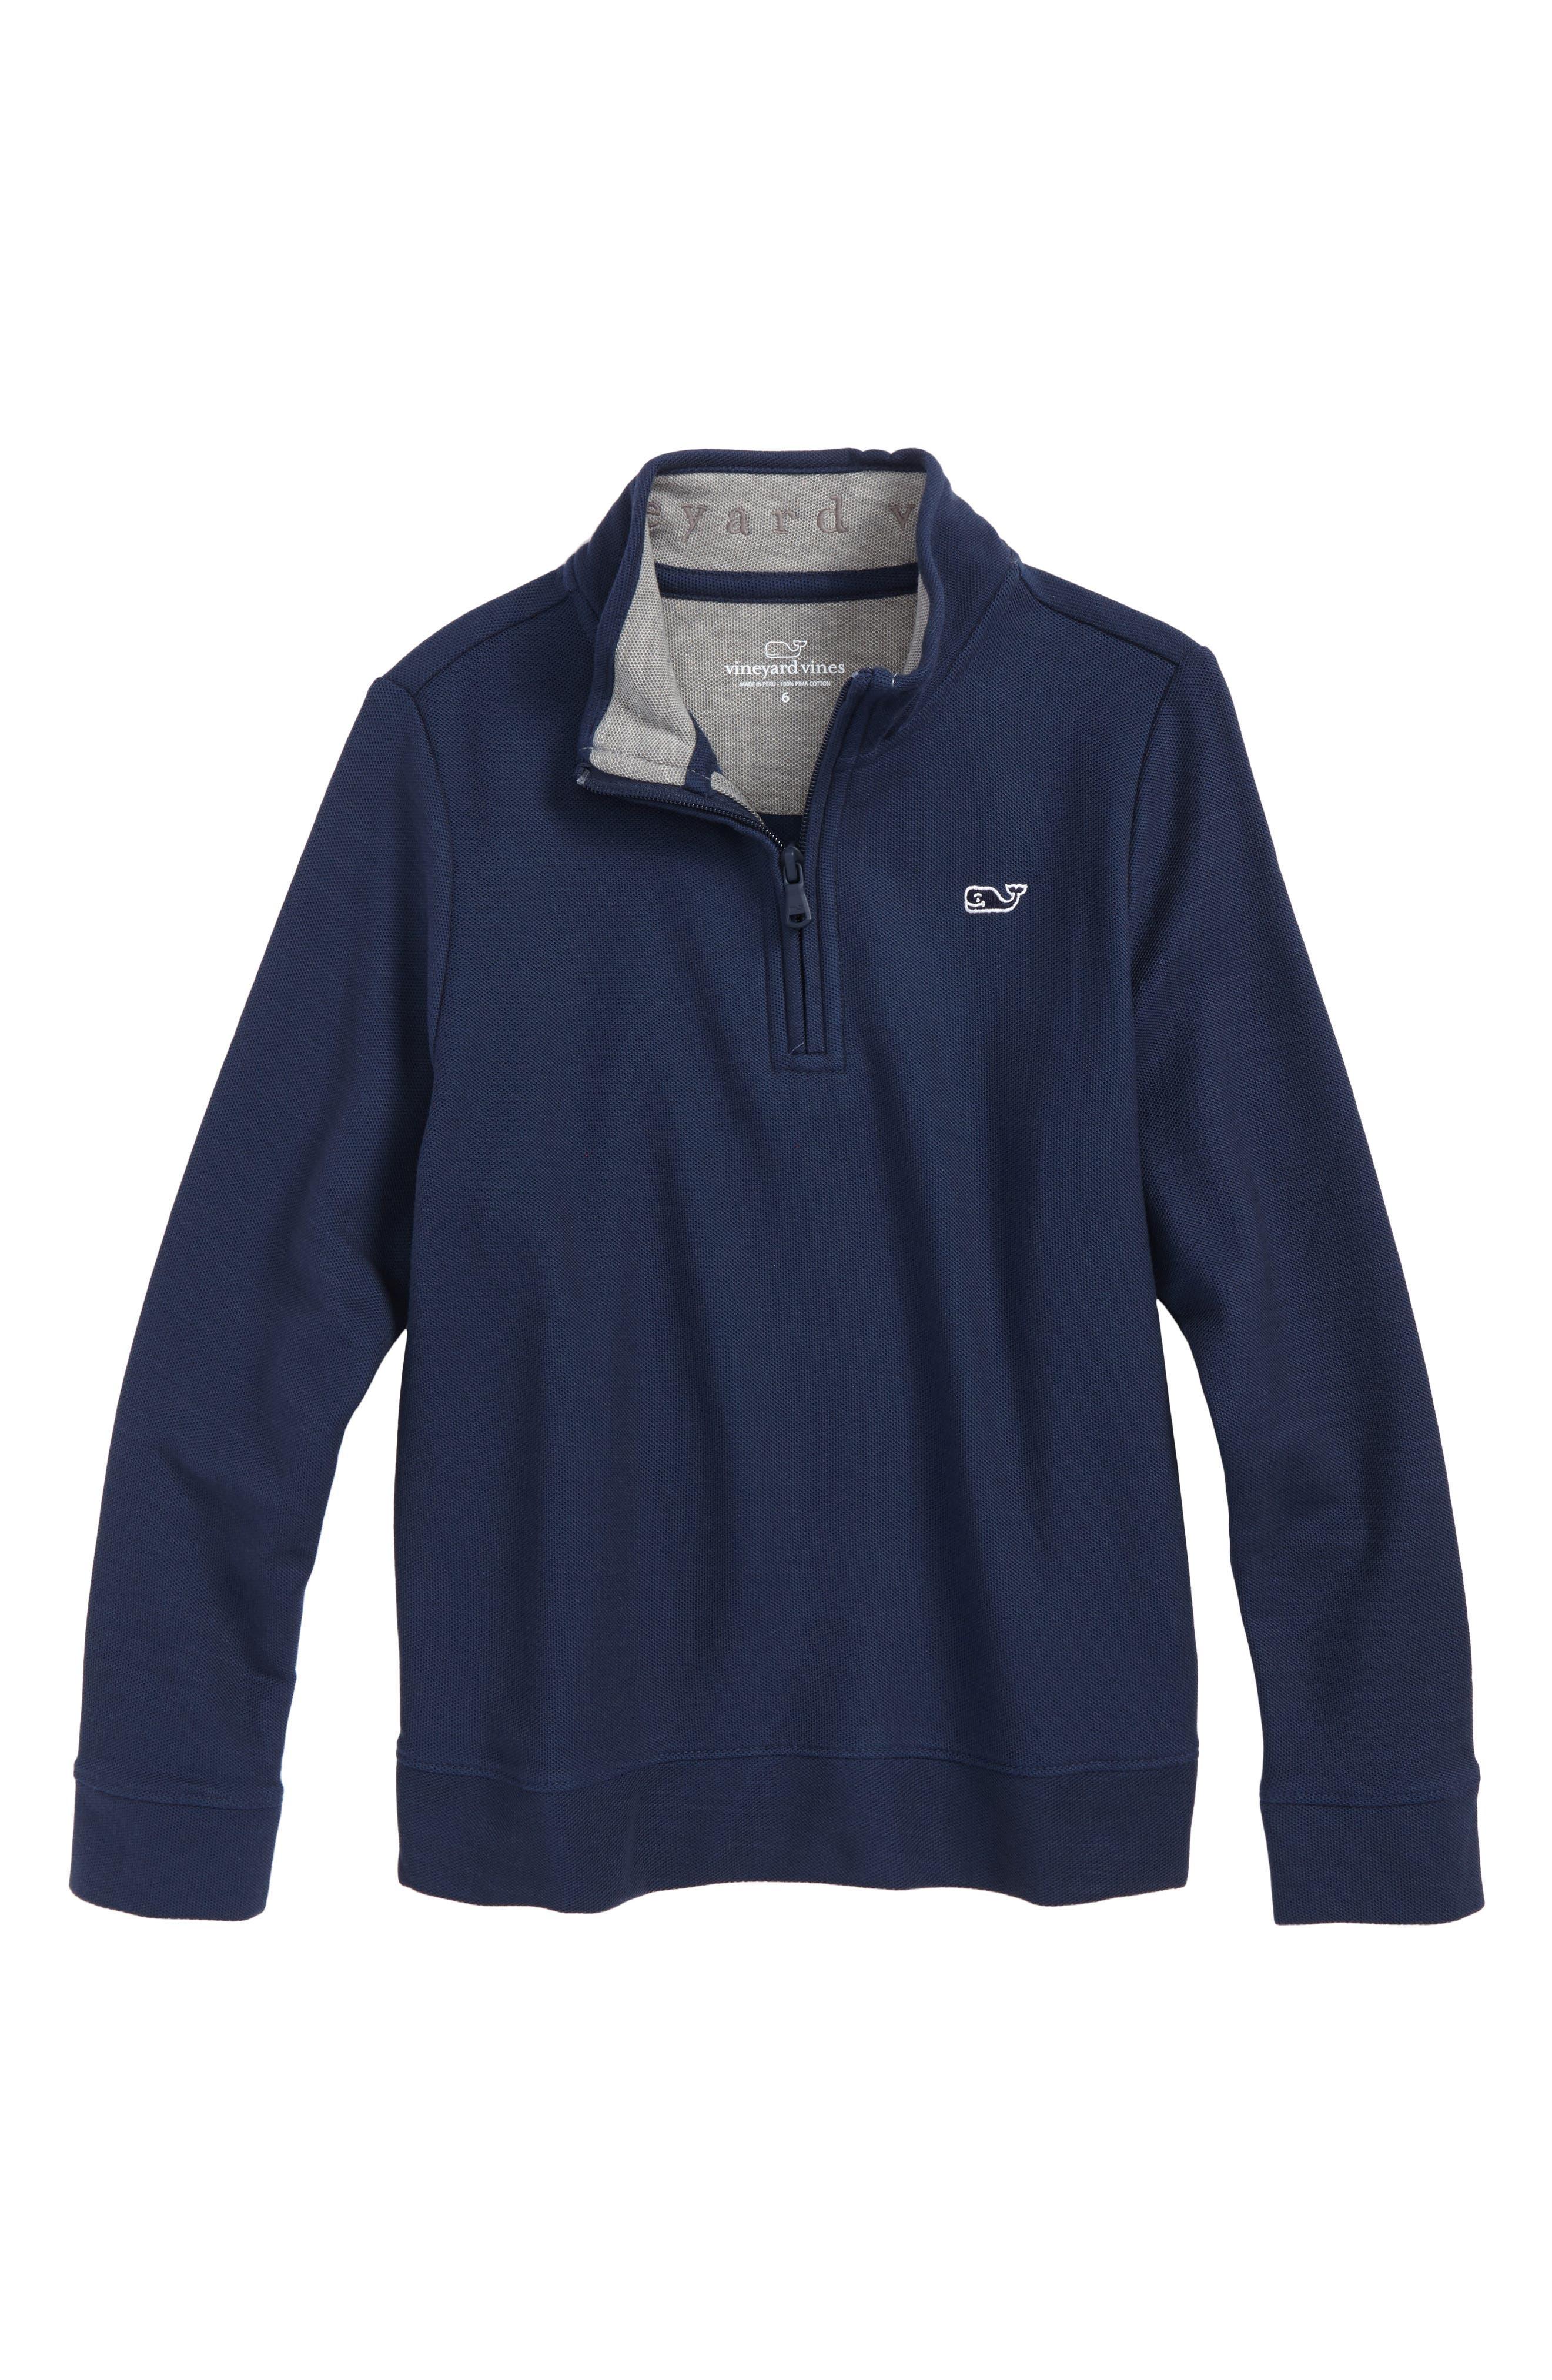 d4dde59b7c Kids' Sweaters Apparel: T-Shirts, Jeans, Pants & Hoodies   Nordstrom